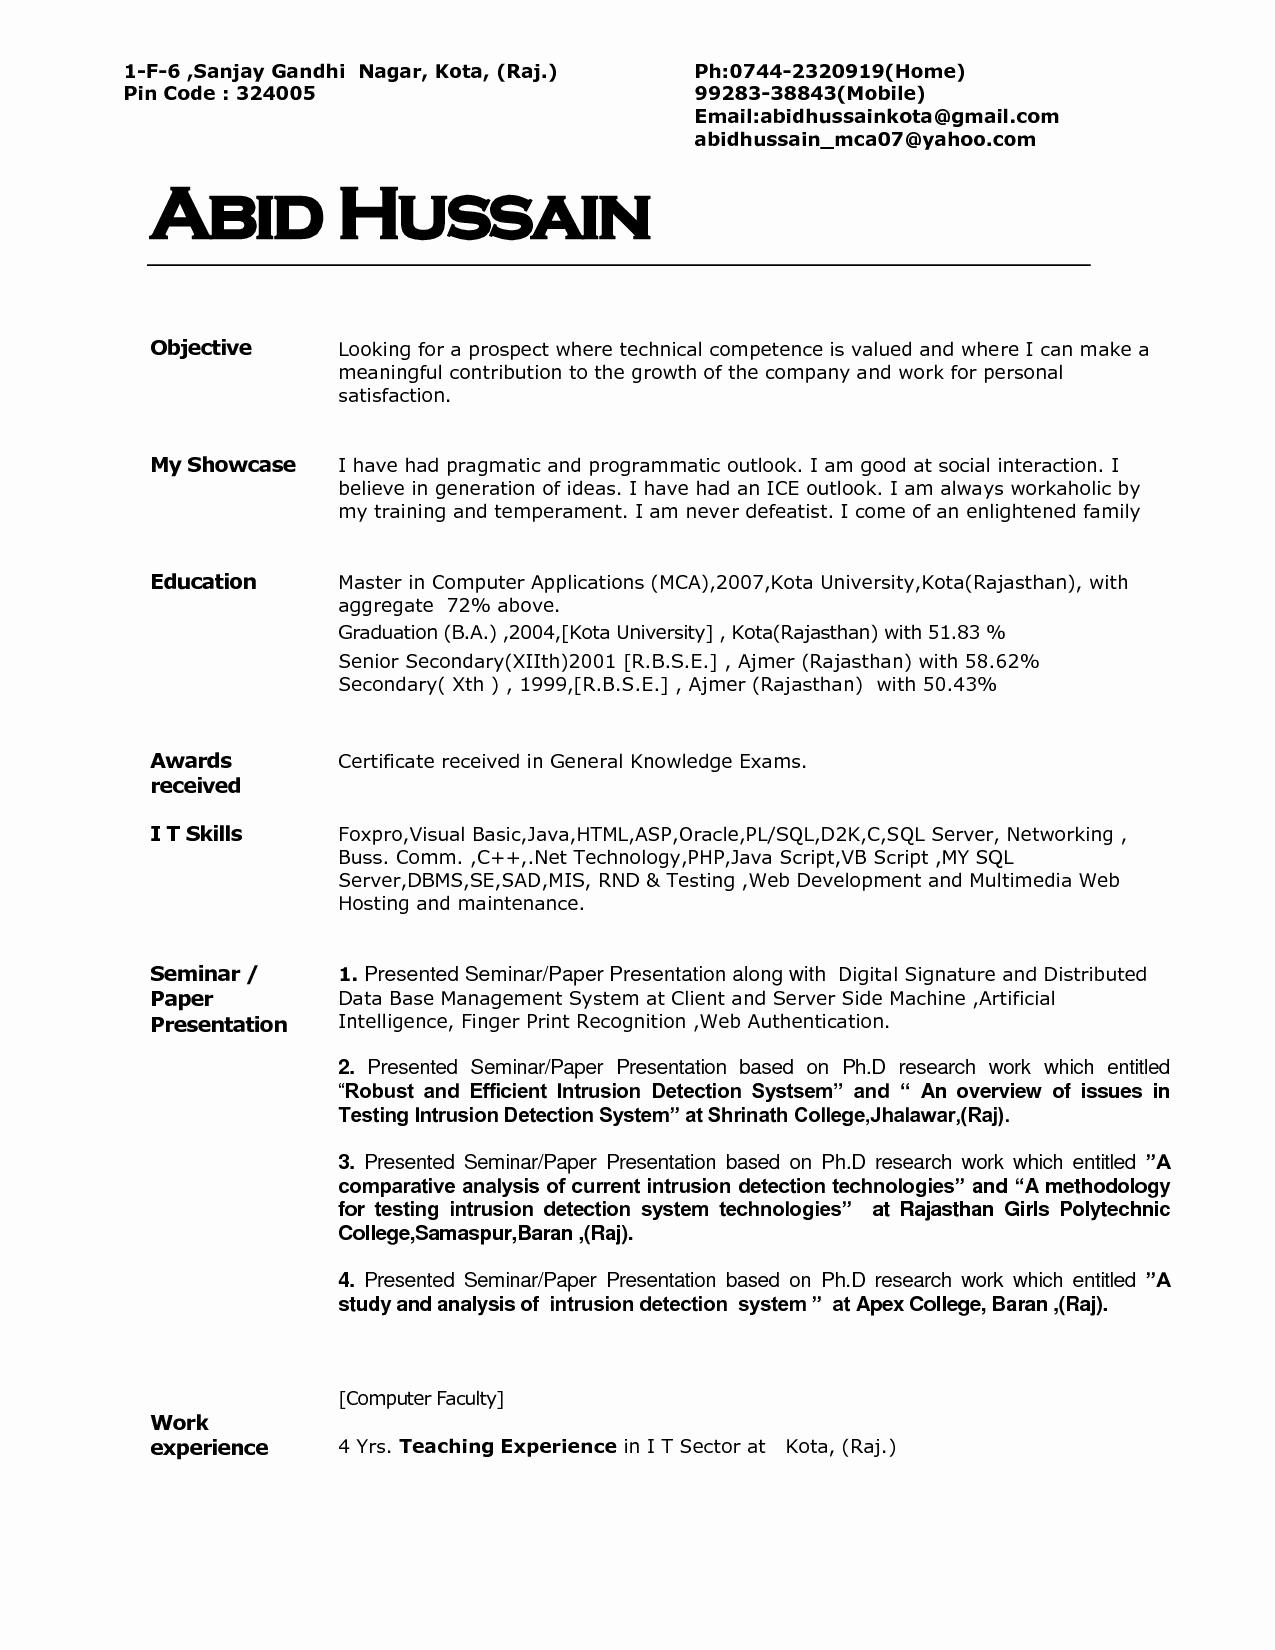 Resumes On Microsoft Word 2007 Lovely Download Resume Wizard Microsoft Word 2007 Bongdaao